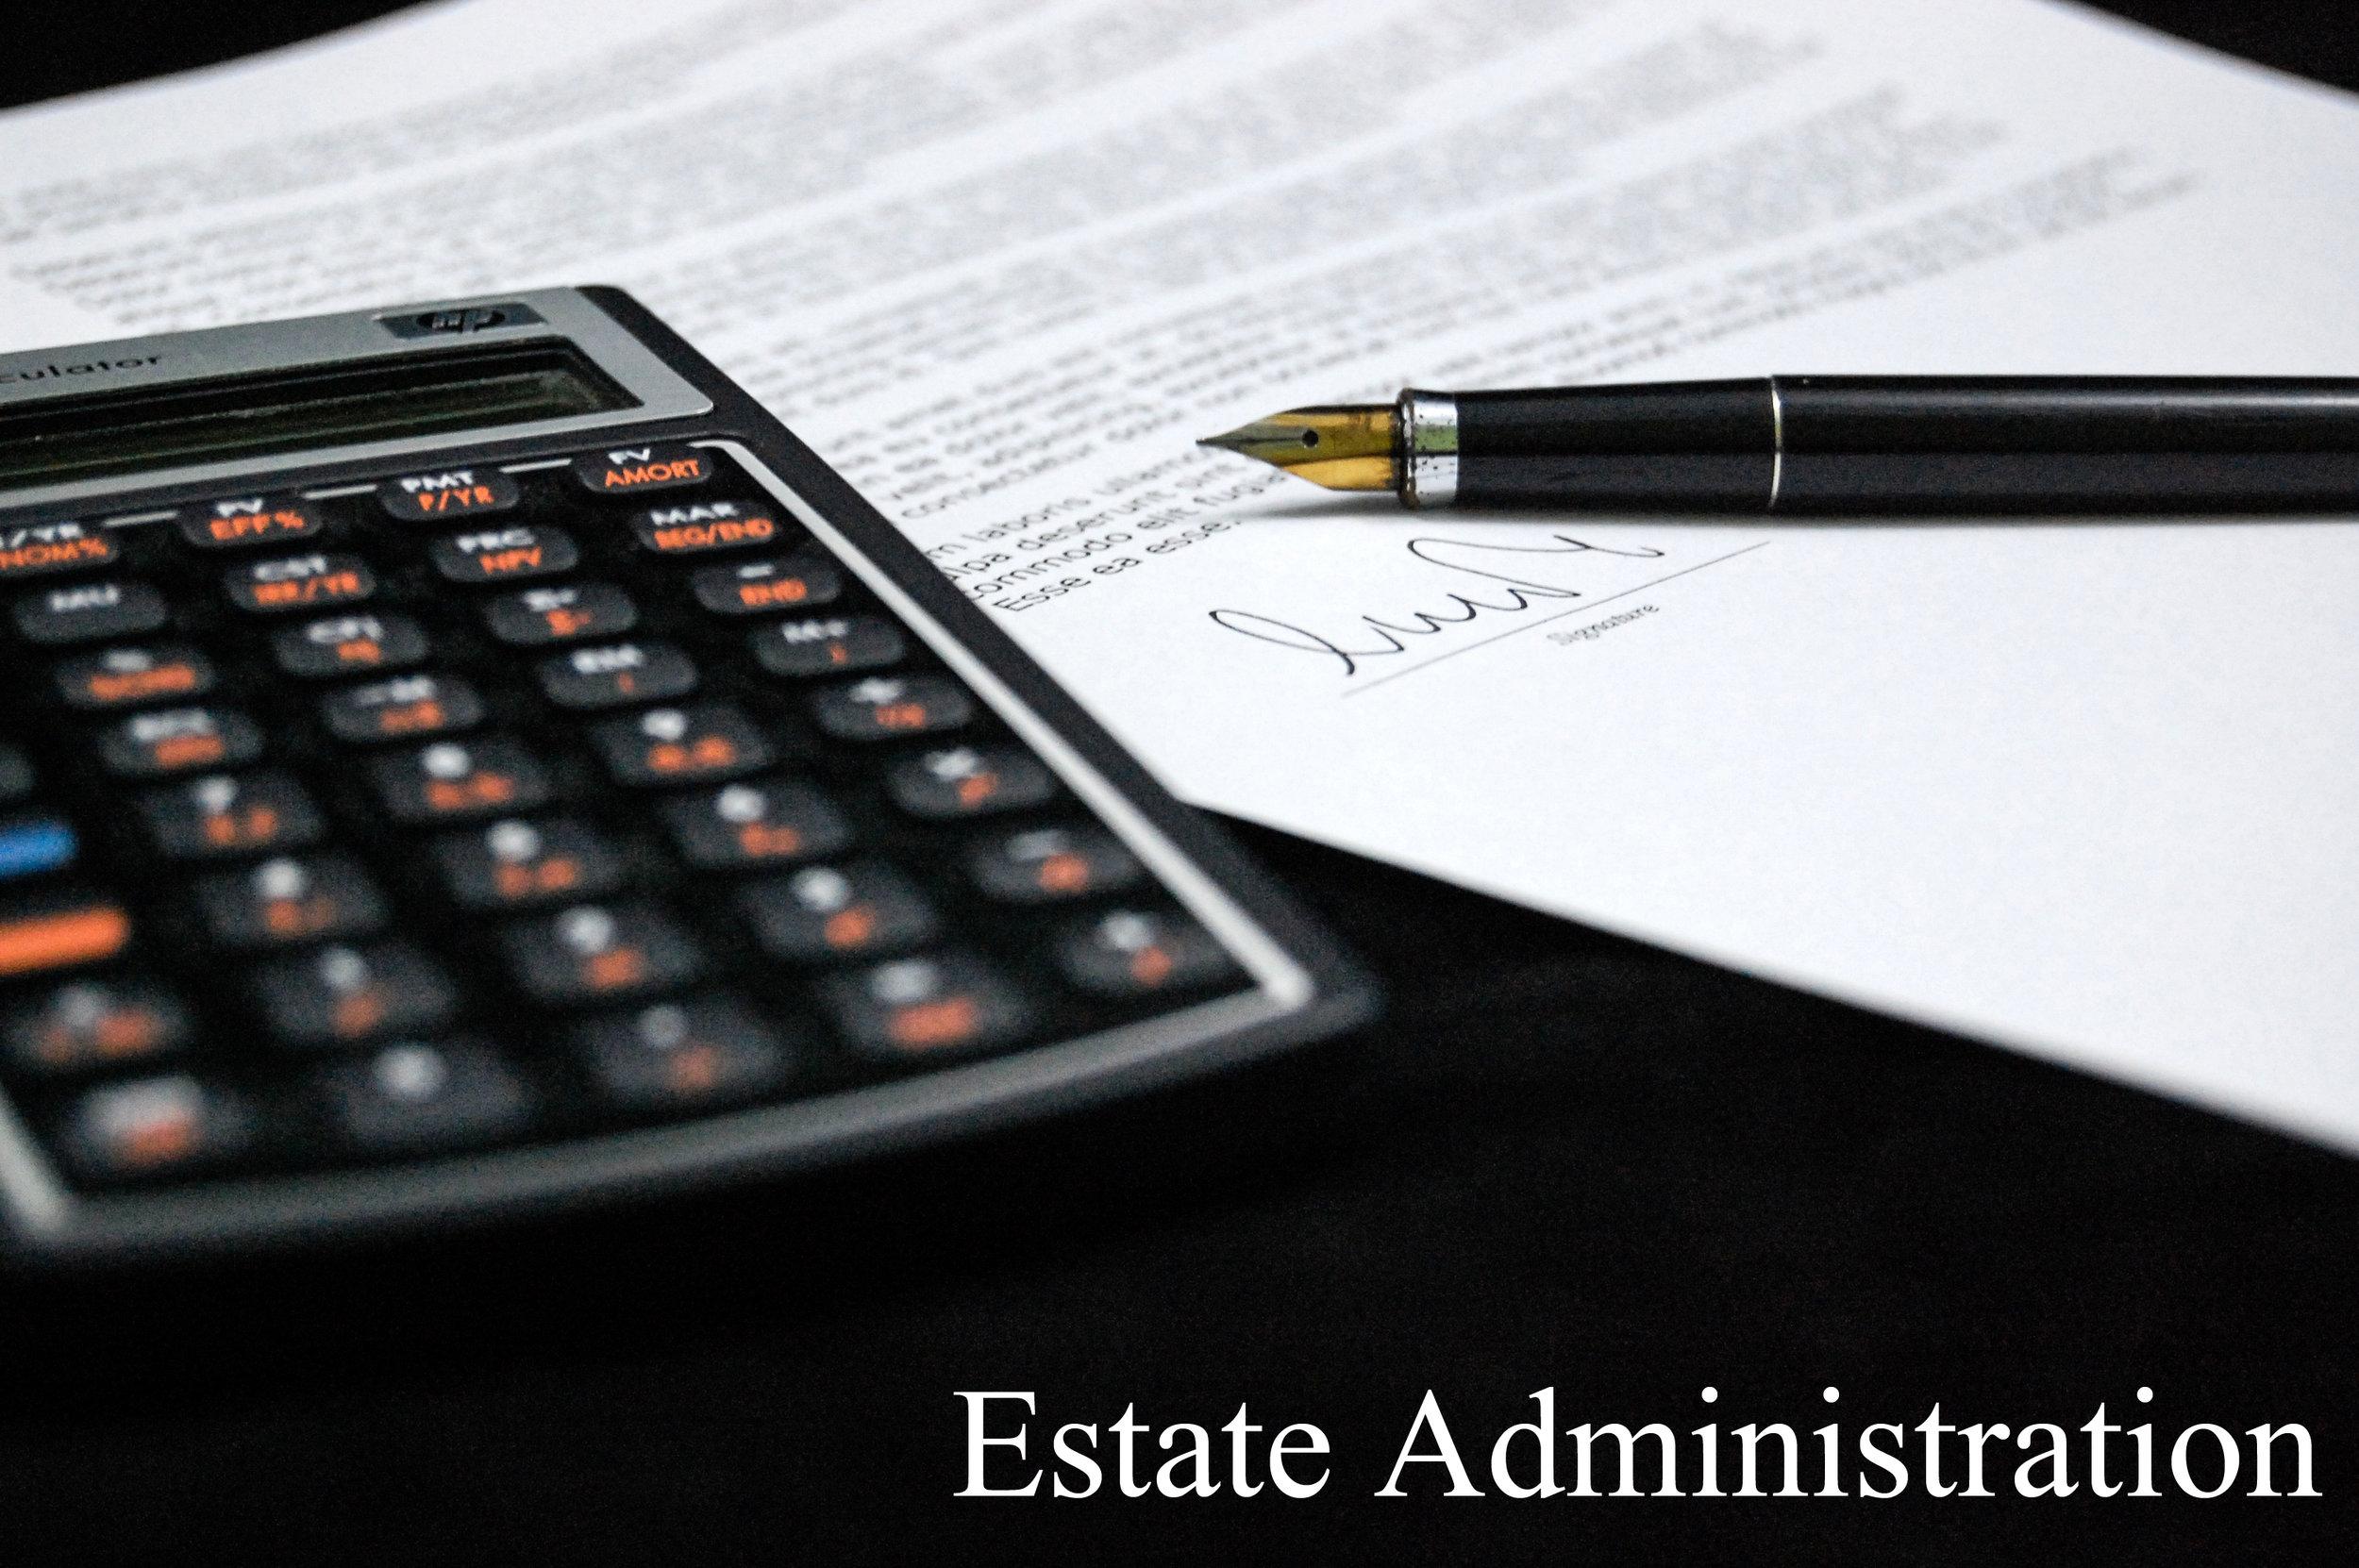 Estate Administration copy.jpg